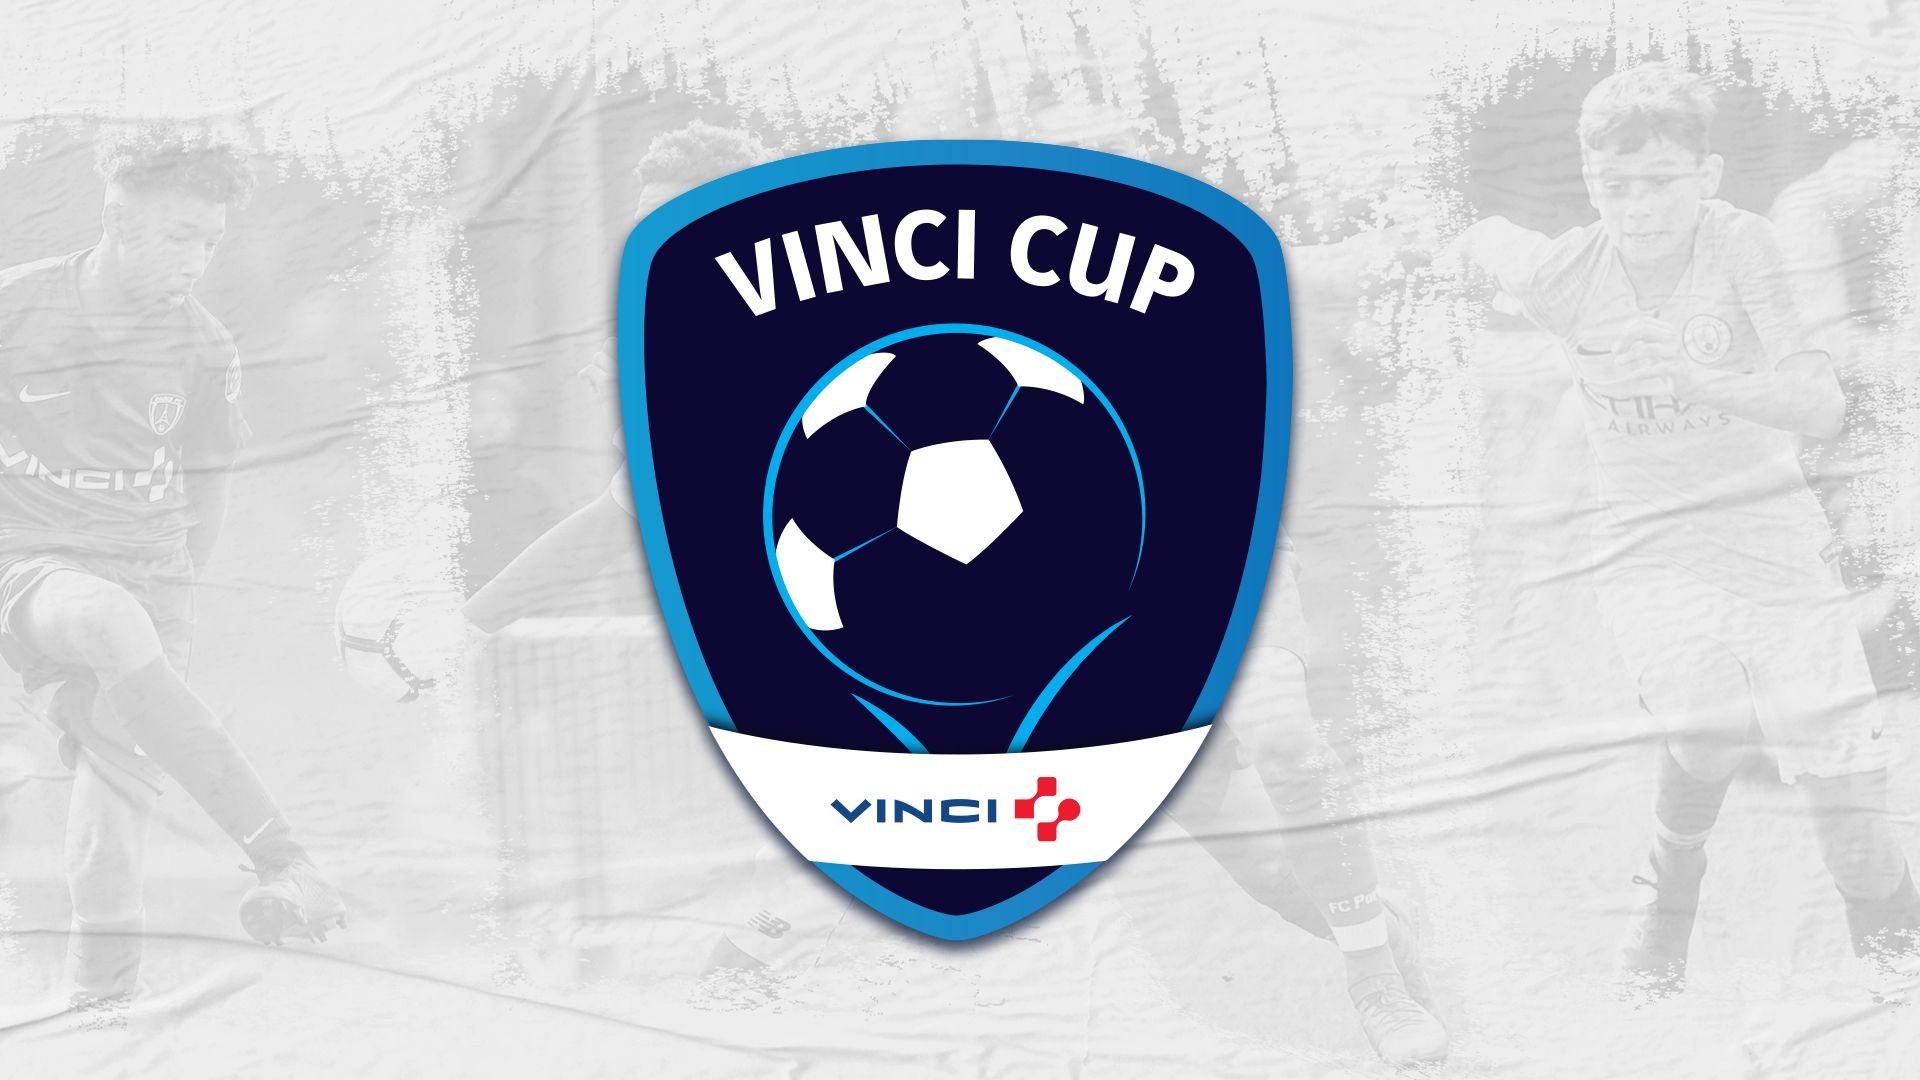 Football – Vinci Cup (Paris FC)